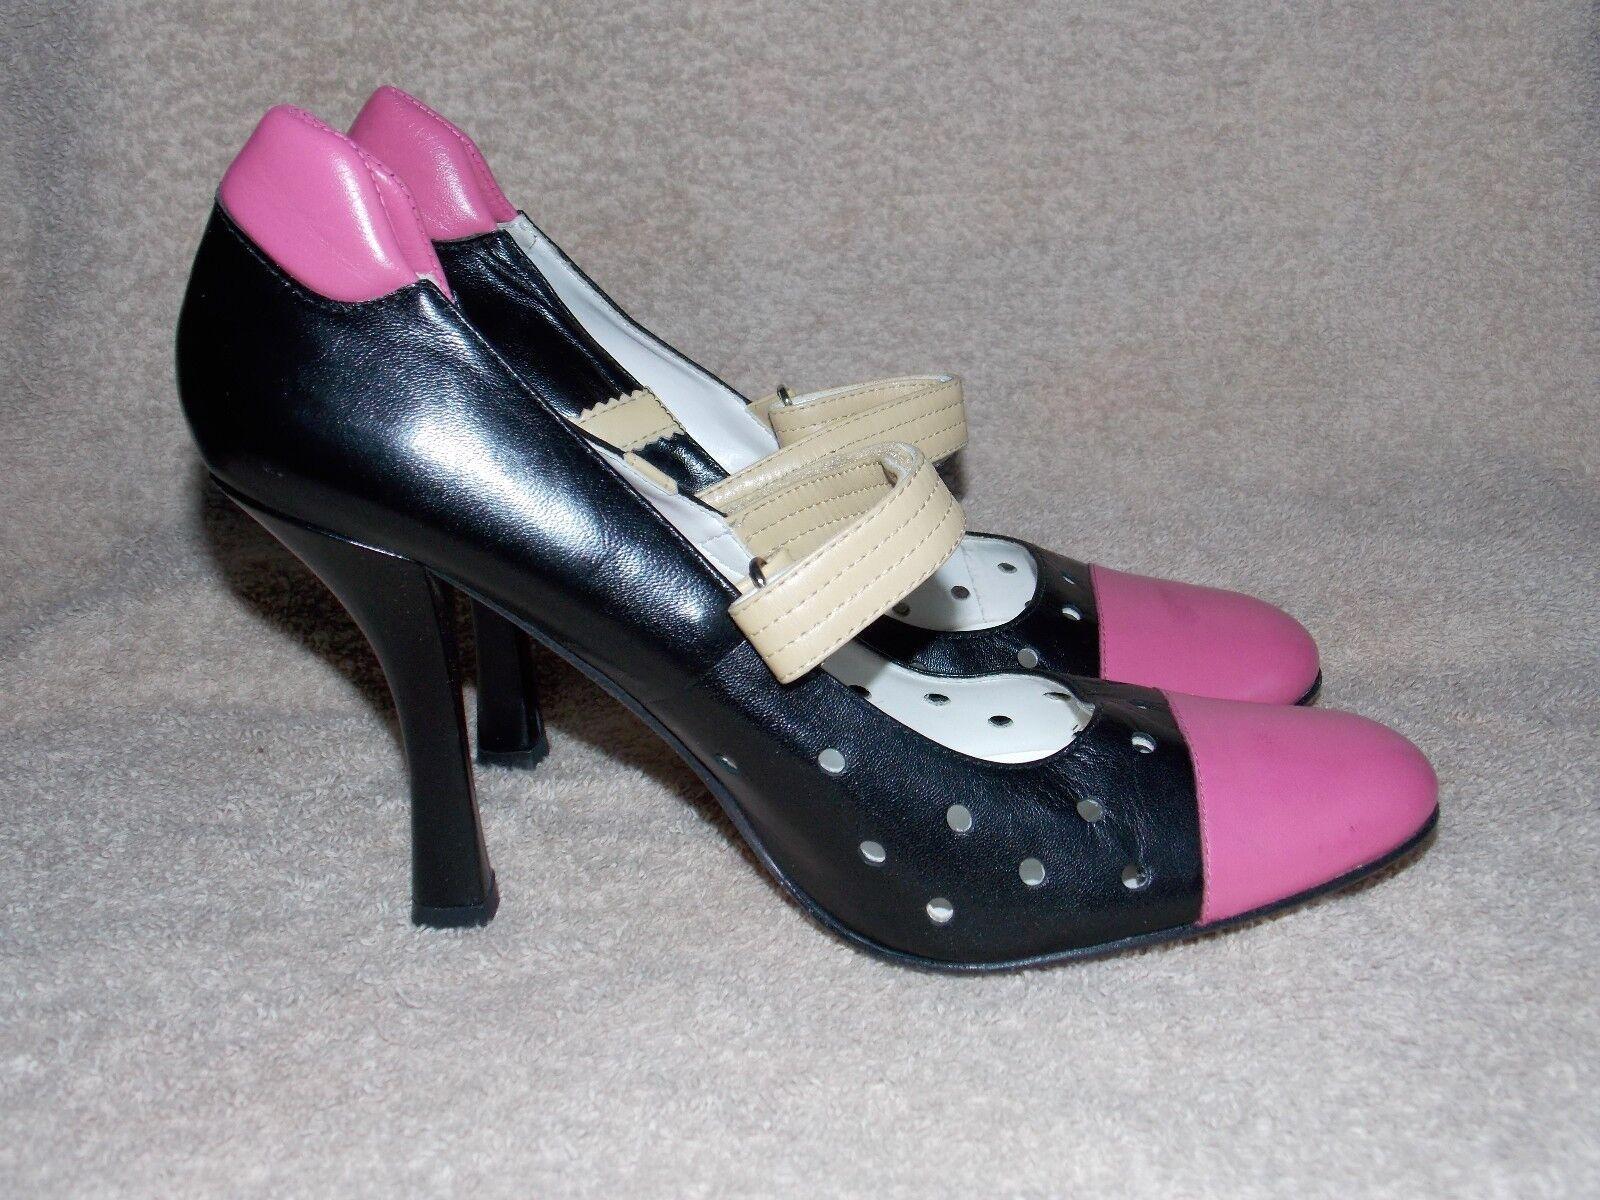 Steven BLACK PINK BEIGE Strap Pump Leather Heels 10M For Women Used